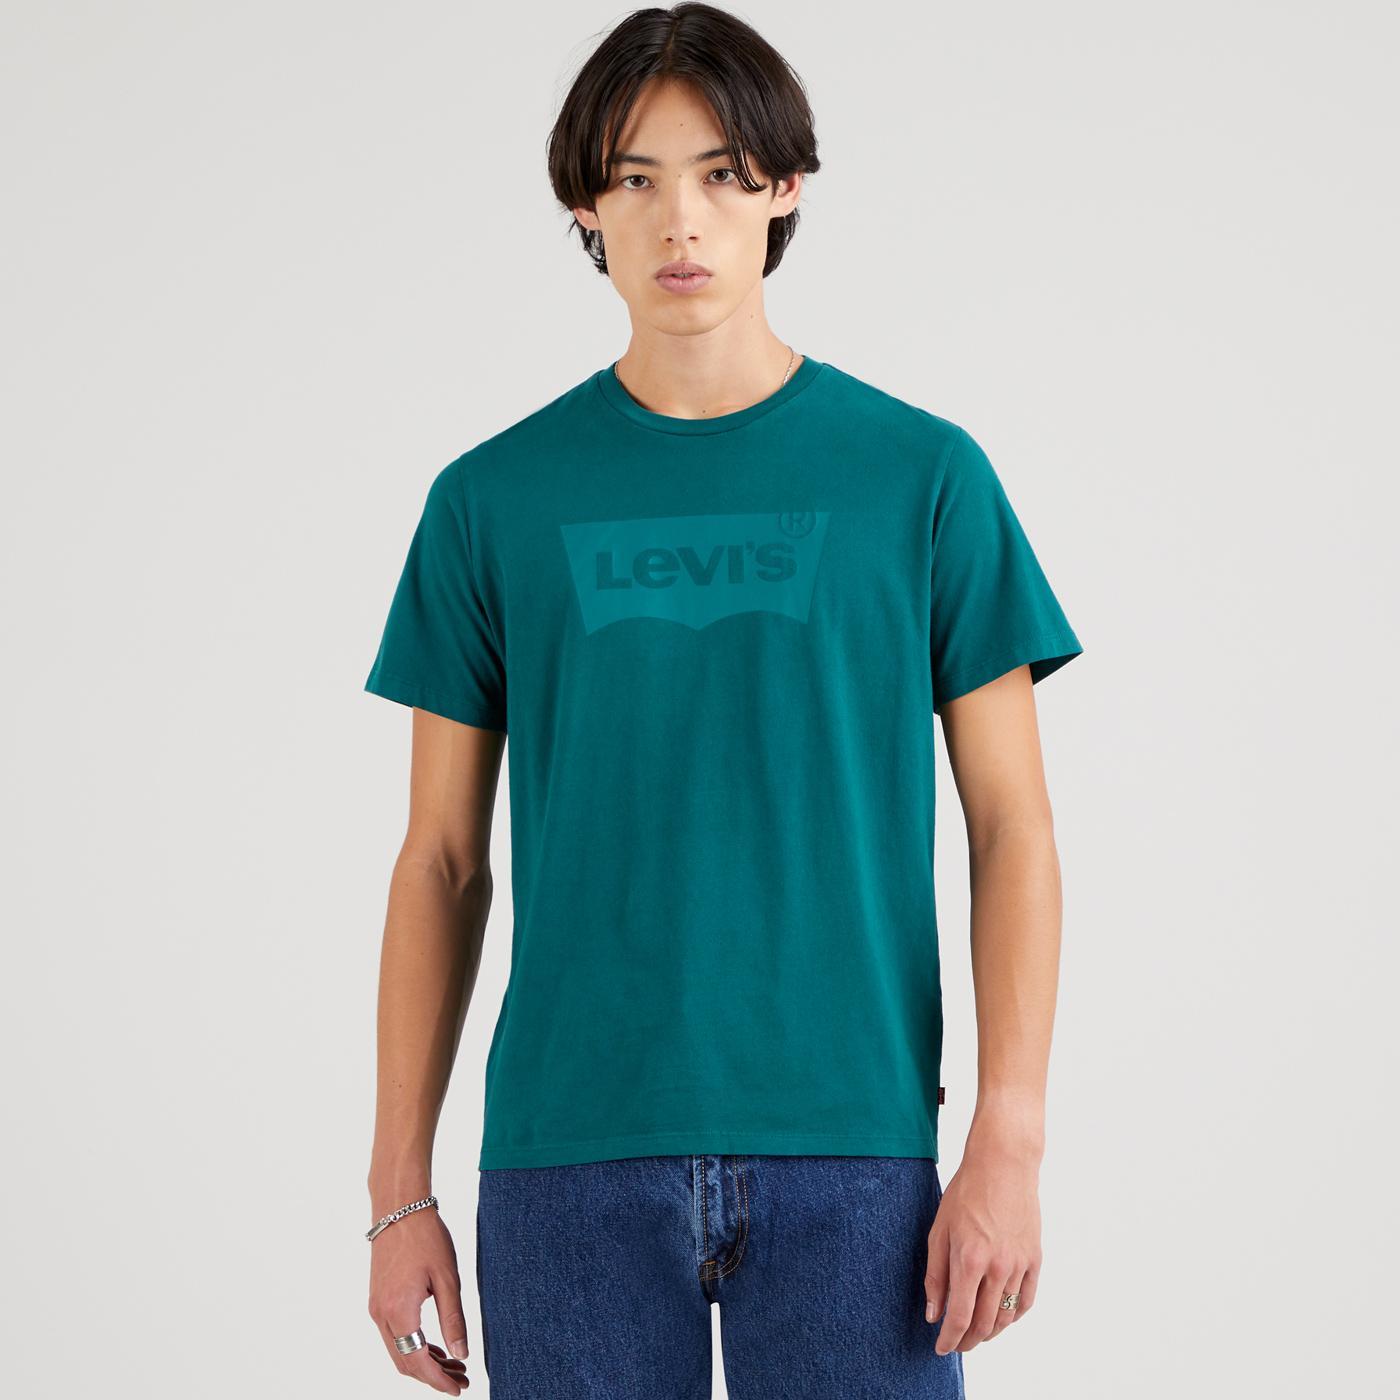 LEVI'S Men's Retro Housemark Batwing T-shirt (FB)